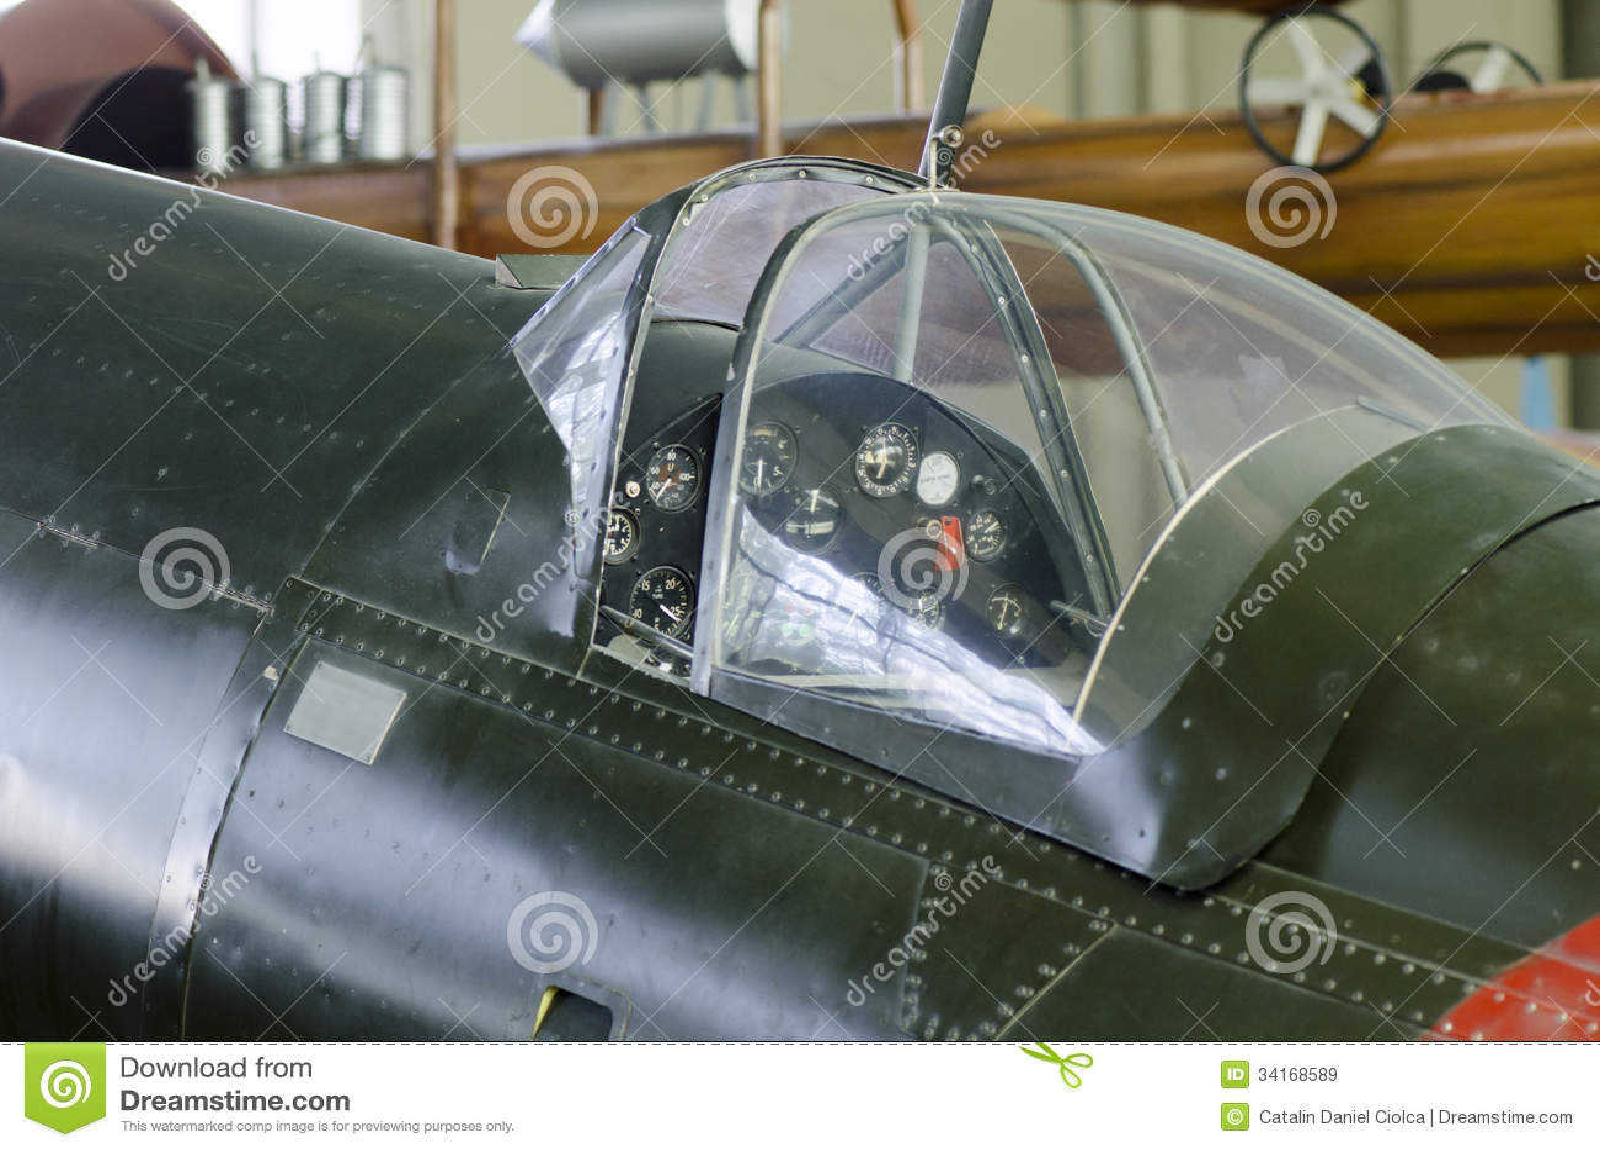 World War Ii Plane Cockpit Royalty Free Stock Images